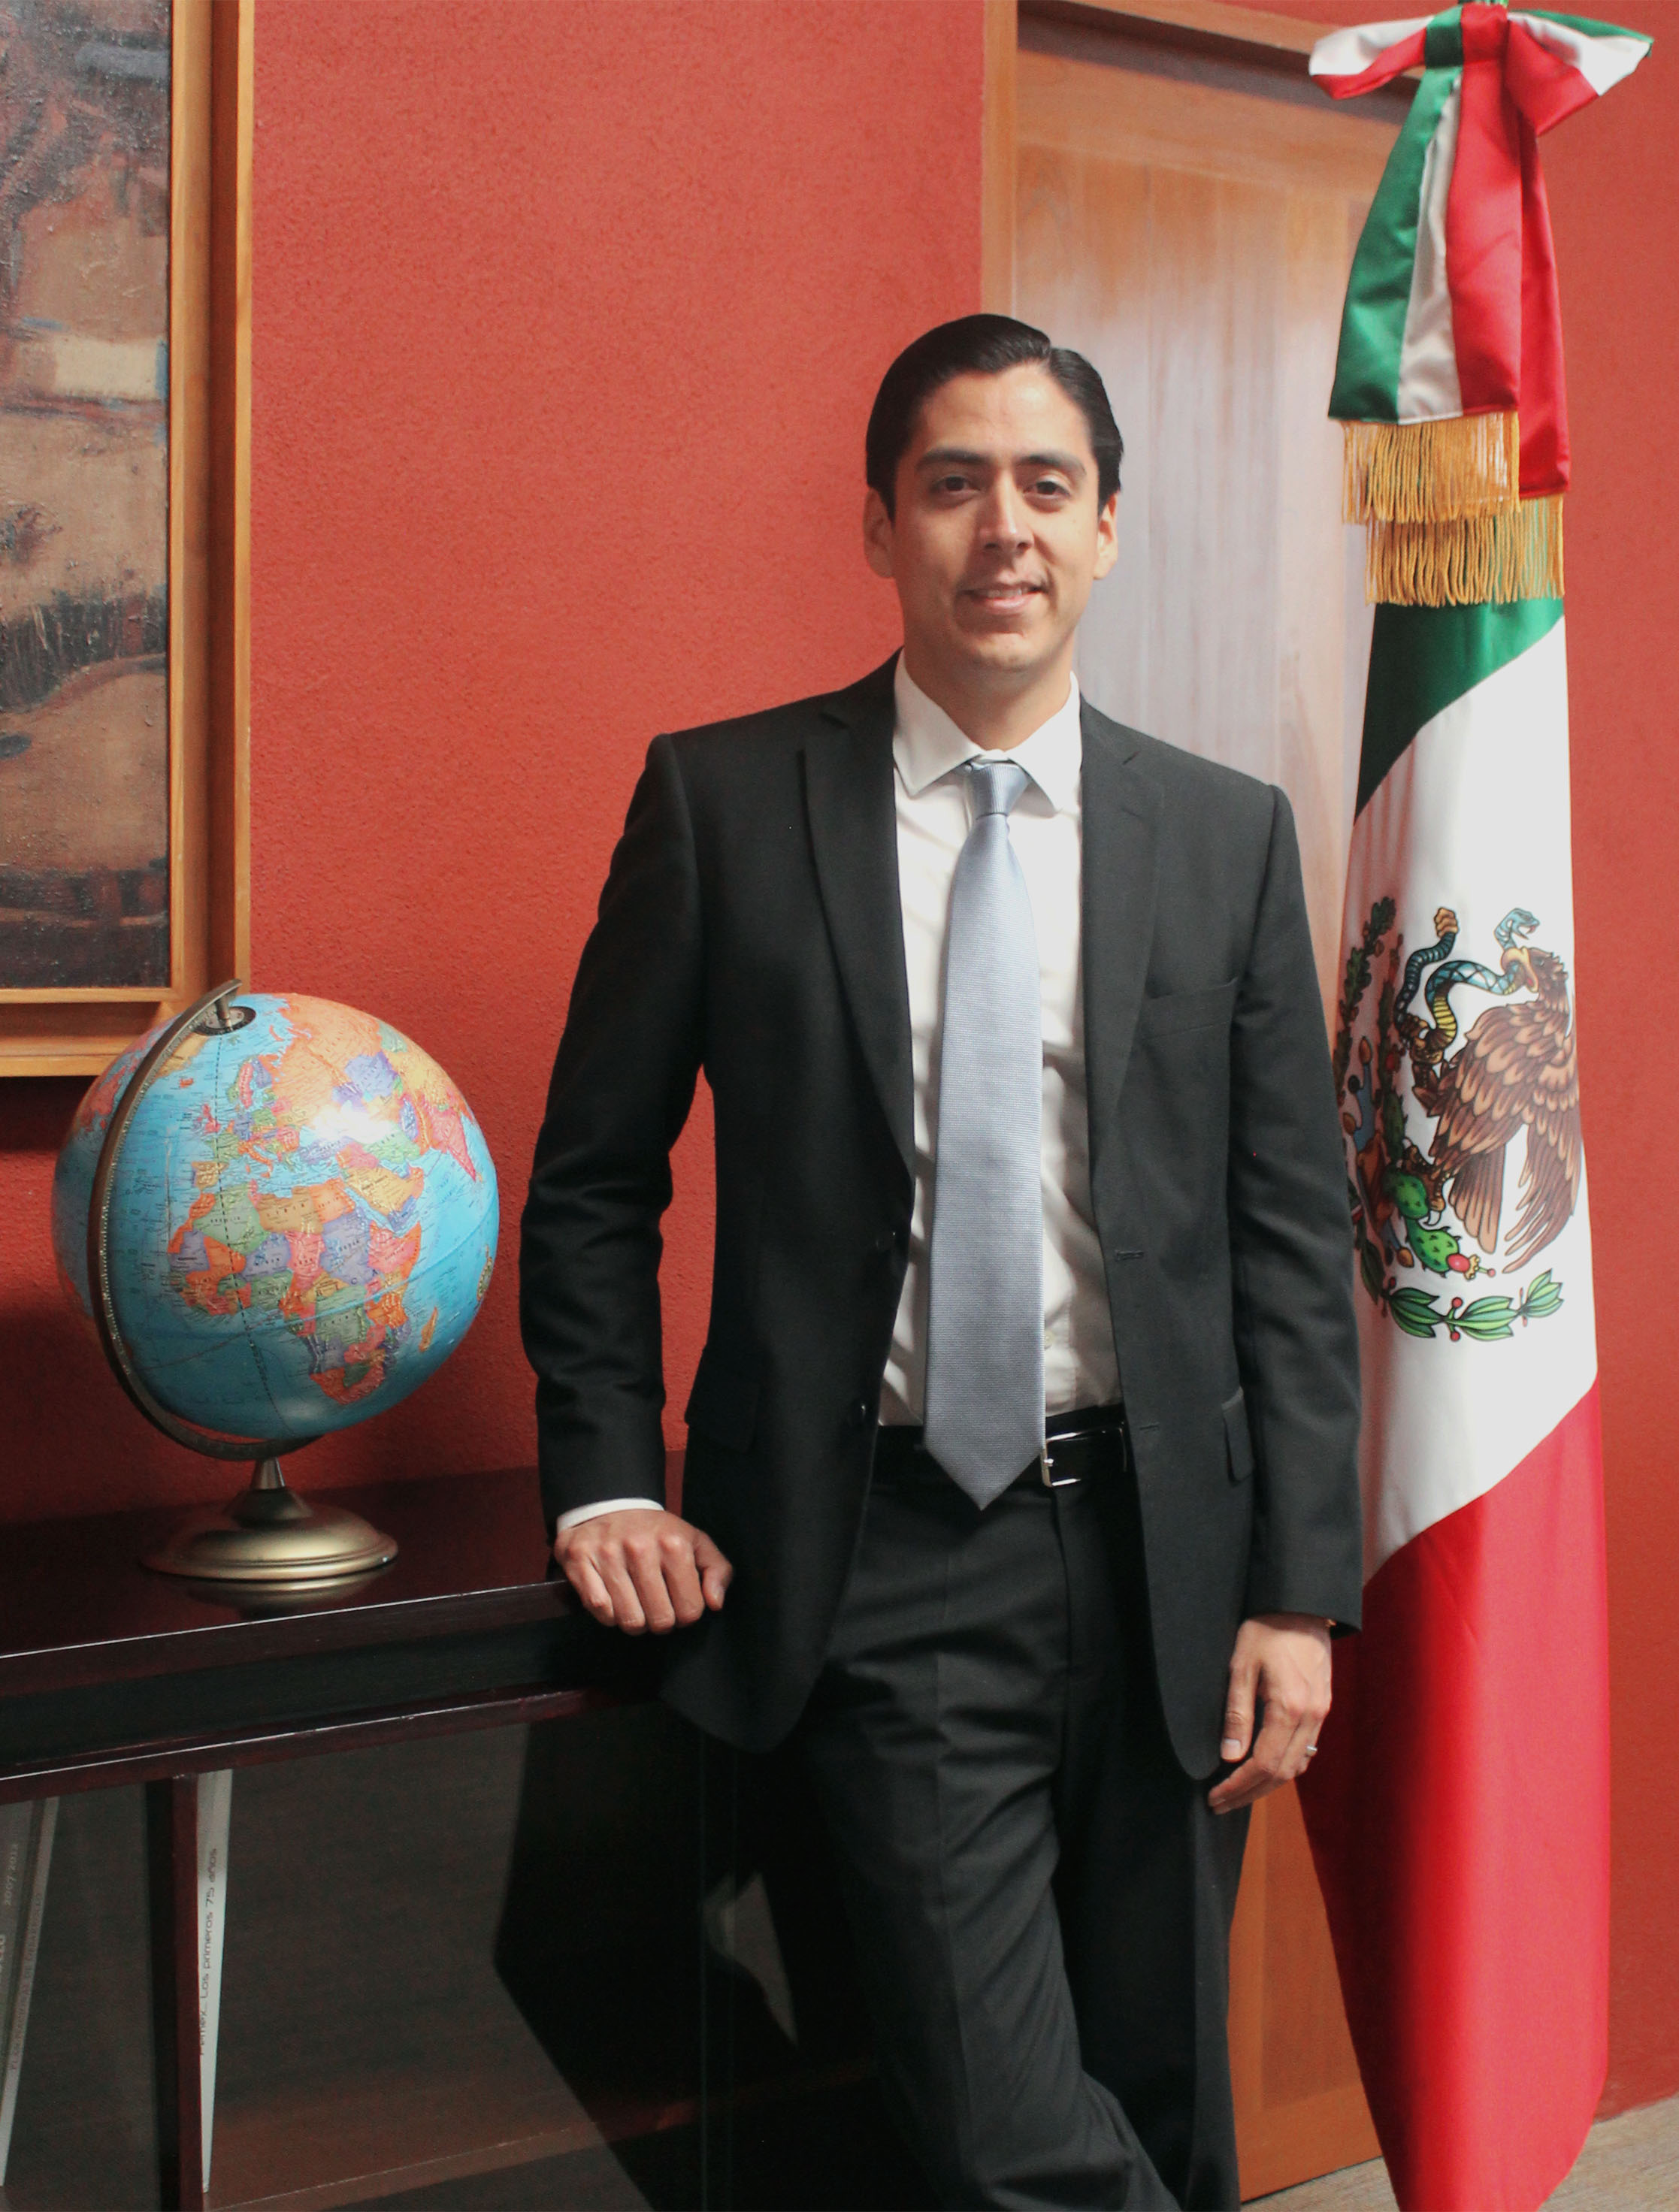 Emilio Granados Franco